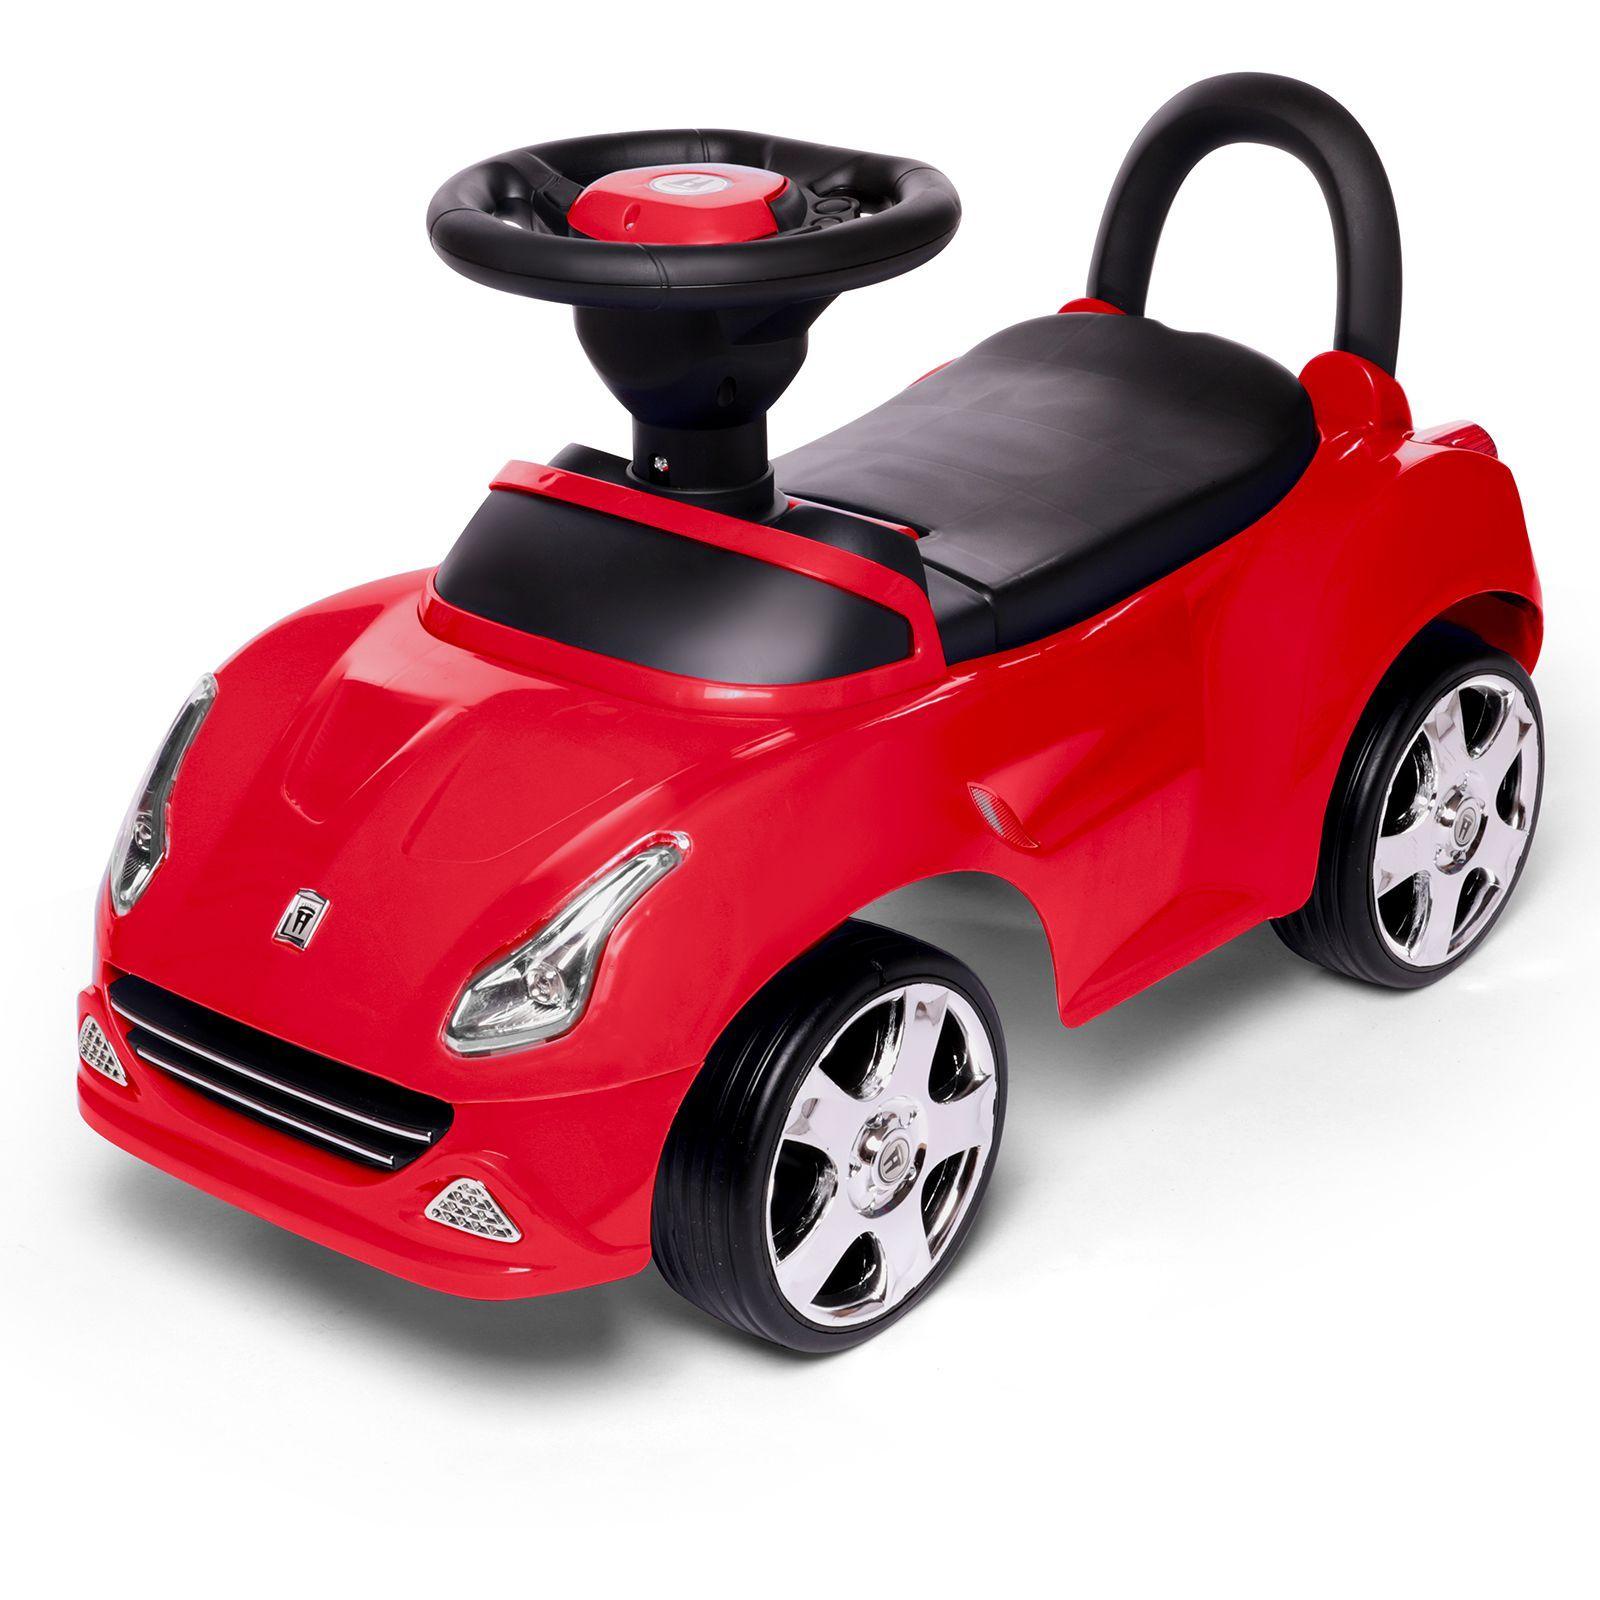 Детская каталка Ride & Go, красная